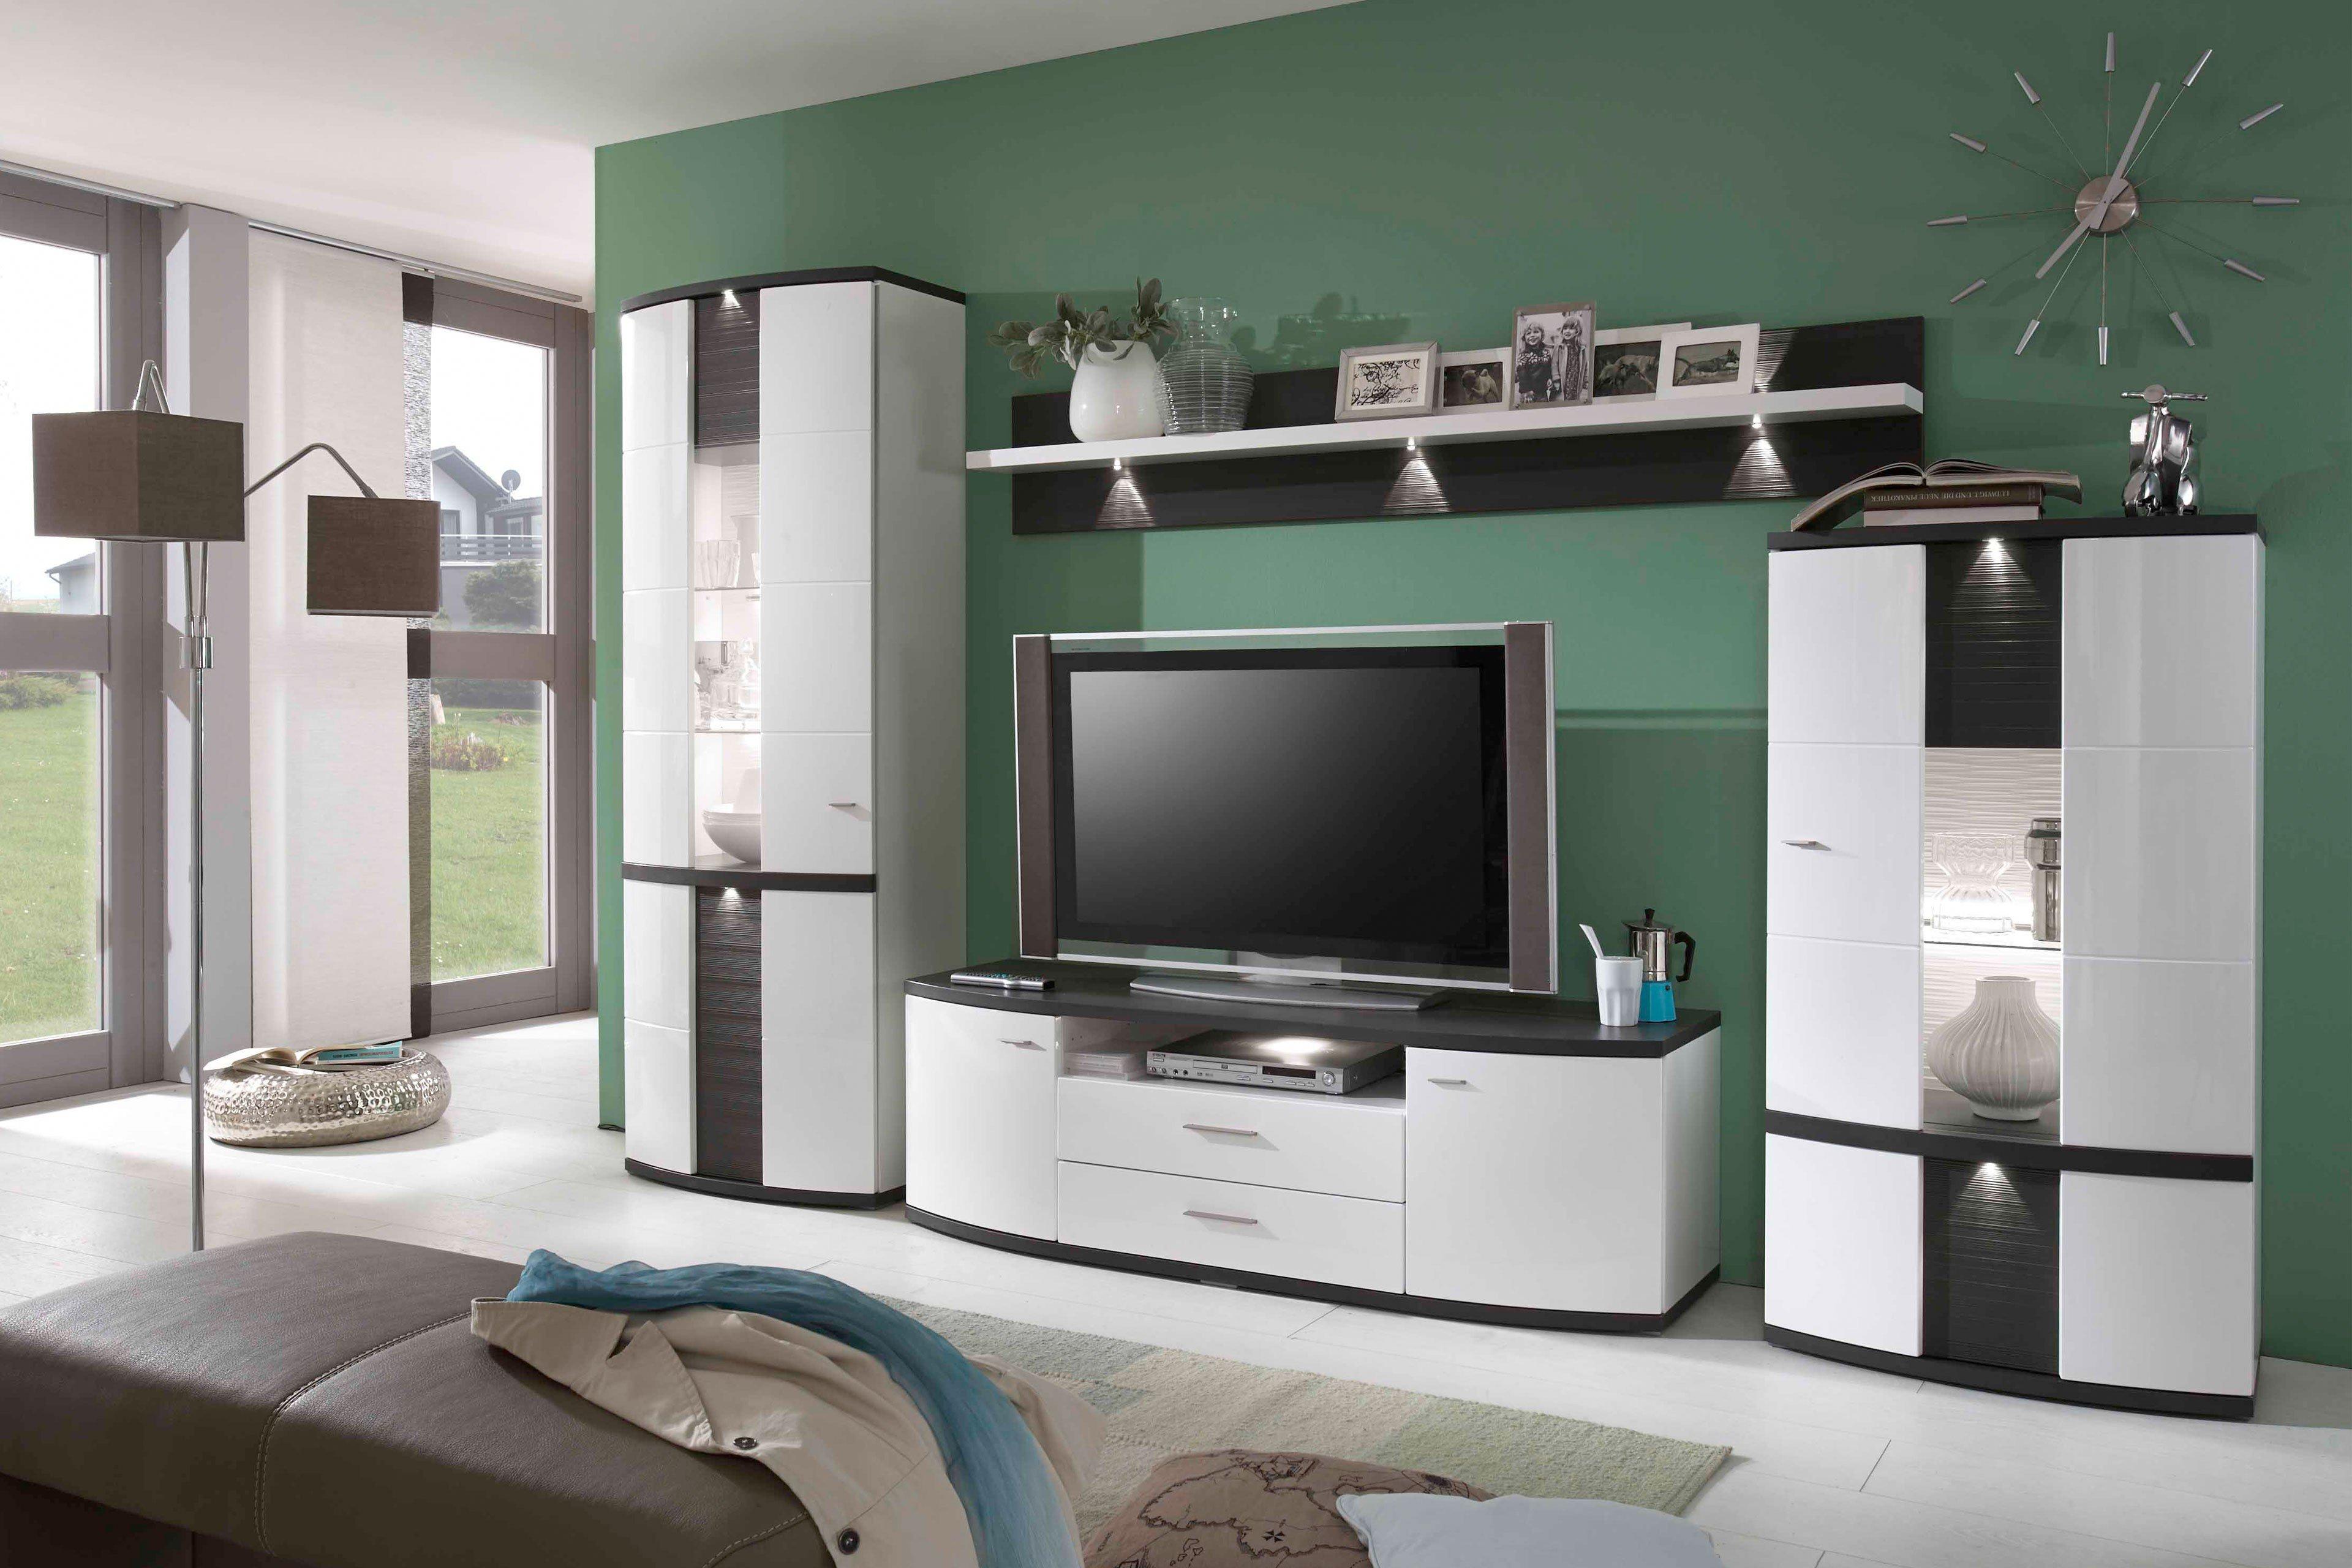 ideal m bel wohnwand cabana 189 wei mit absetzung m bel. Black Bedroom Furniture Sets. Home Design Ideas